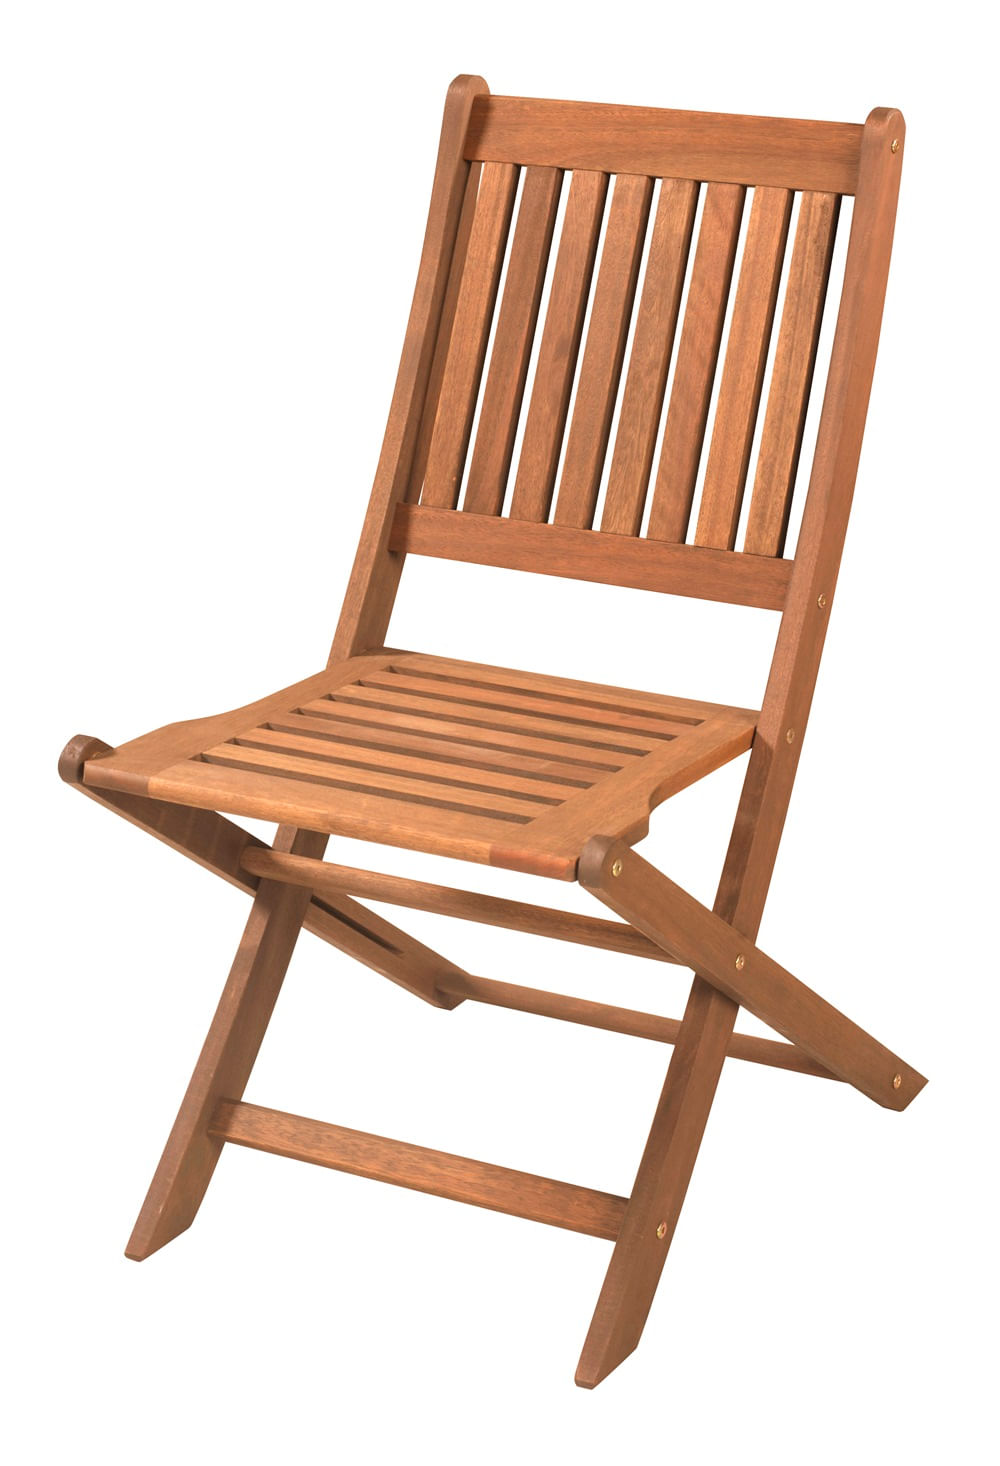 Cadeira Dobravel Sem Braco Cor Stain Jatoba - 15557